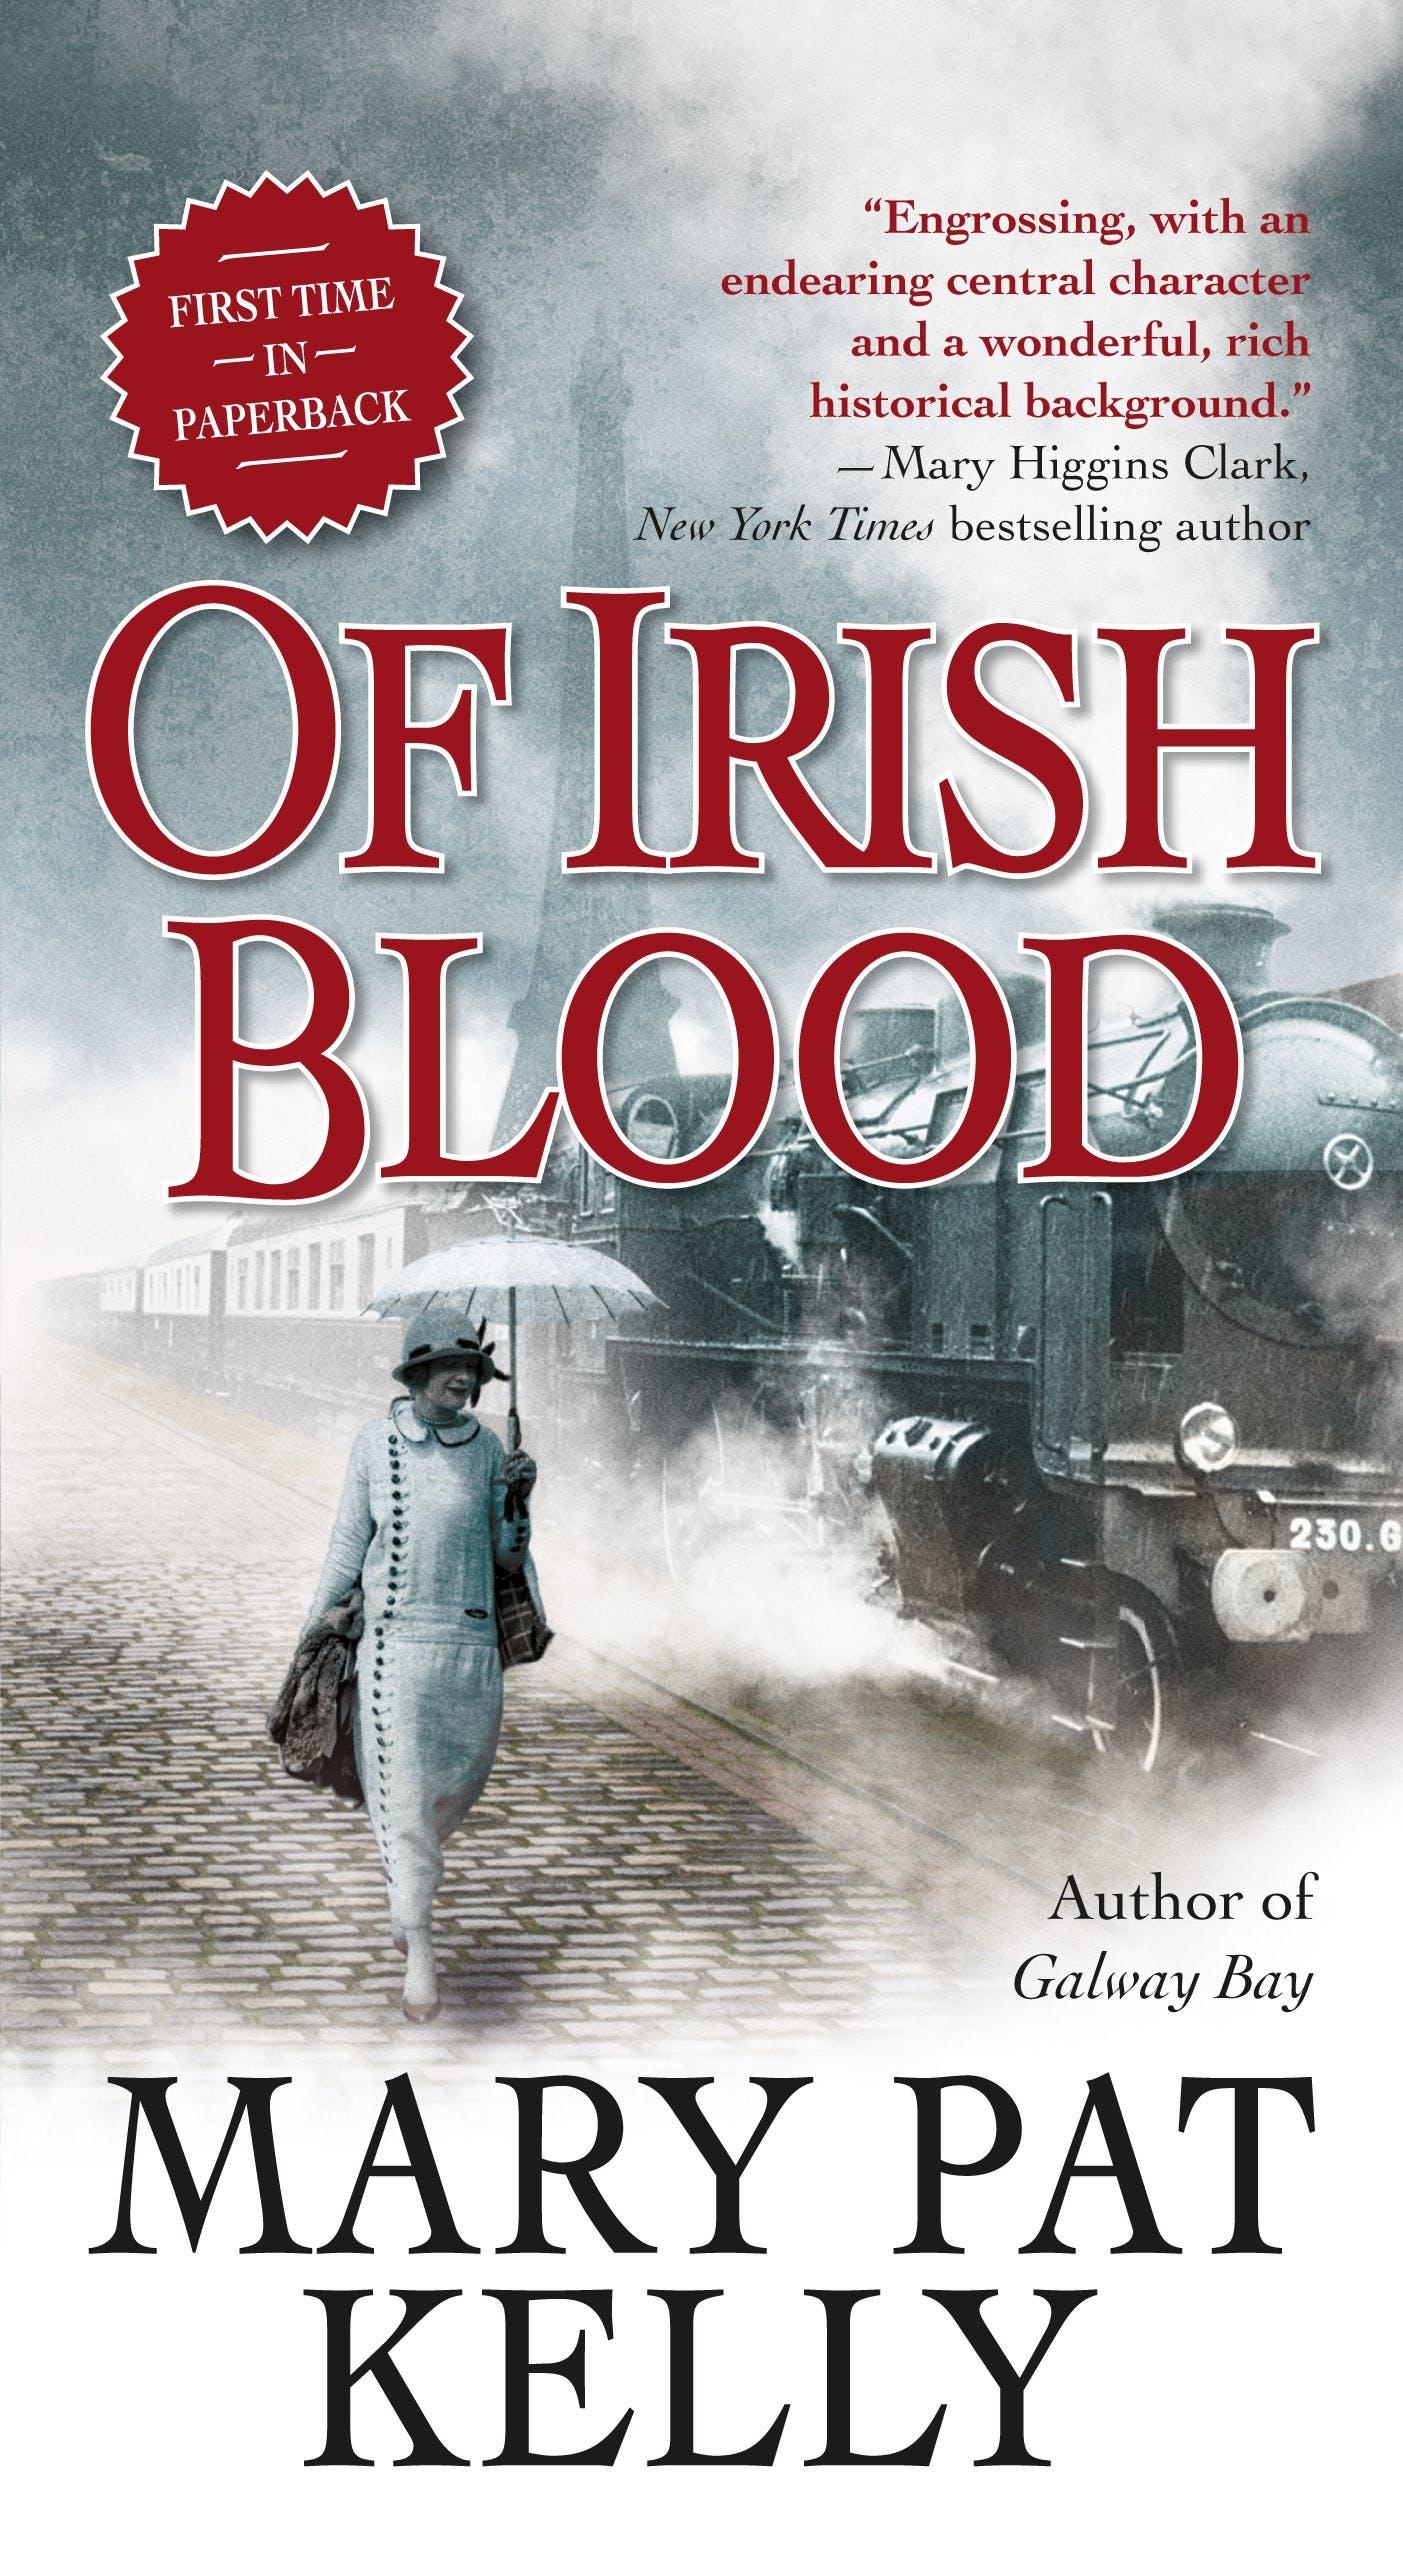 Image of Of Irish Blood